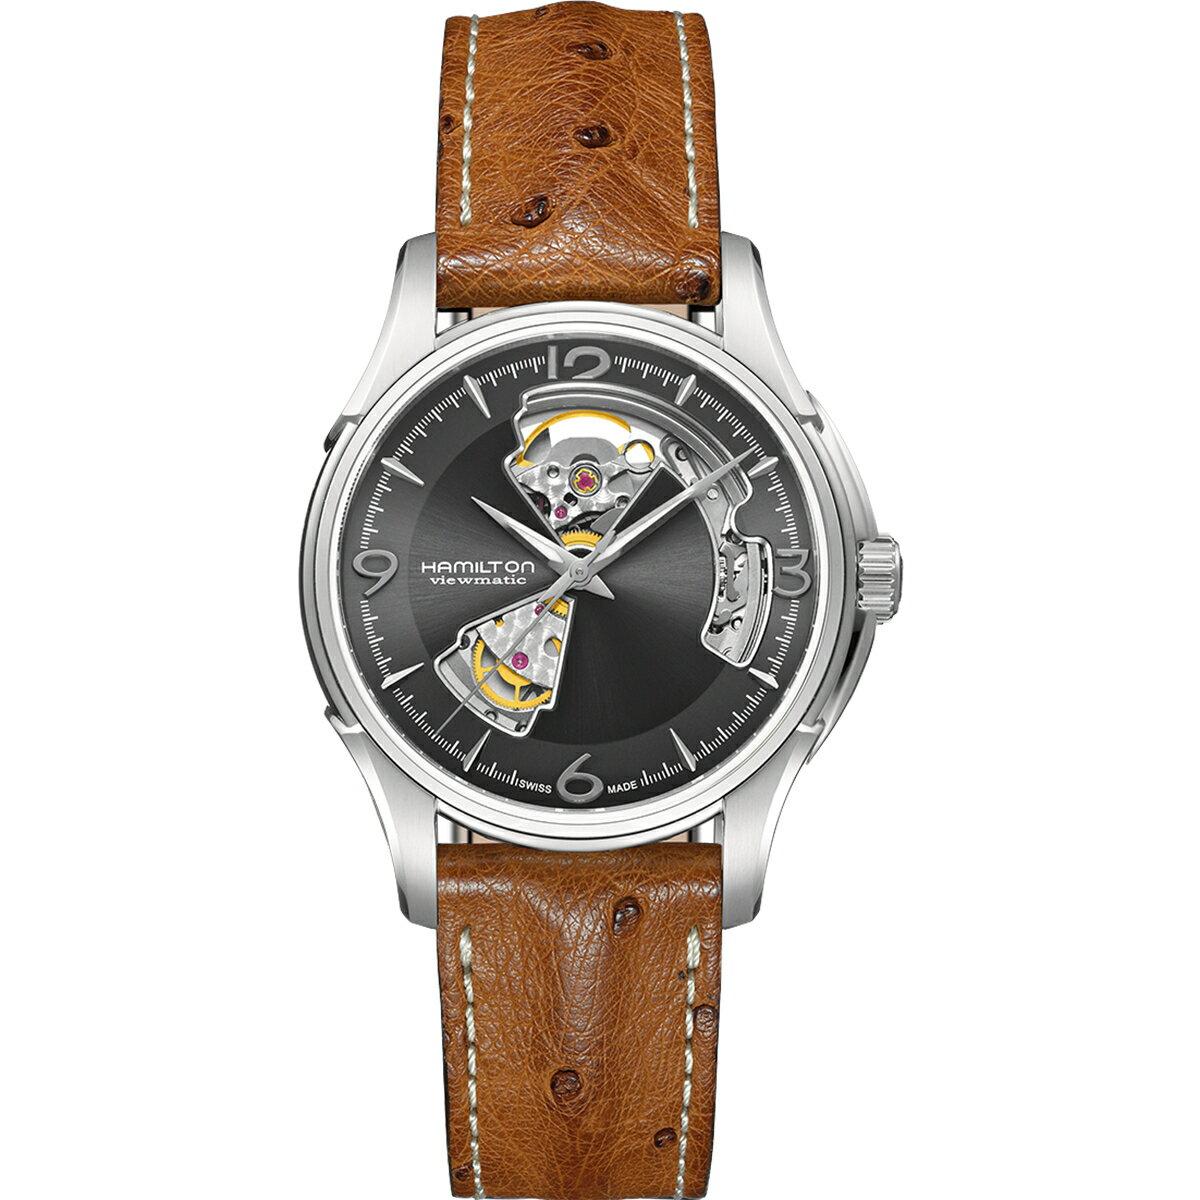 HAMILTON �ミルトン H32565585 メンズ レディース 腕時計 プレゼント  ��ゃれ[海外正�商�][�料無料]